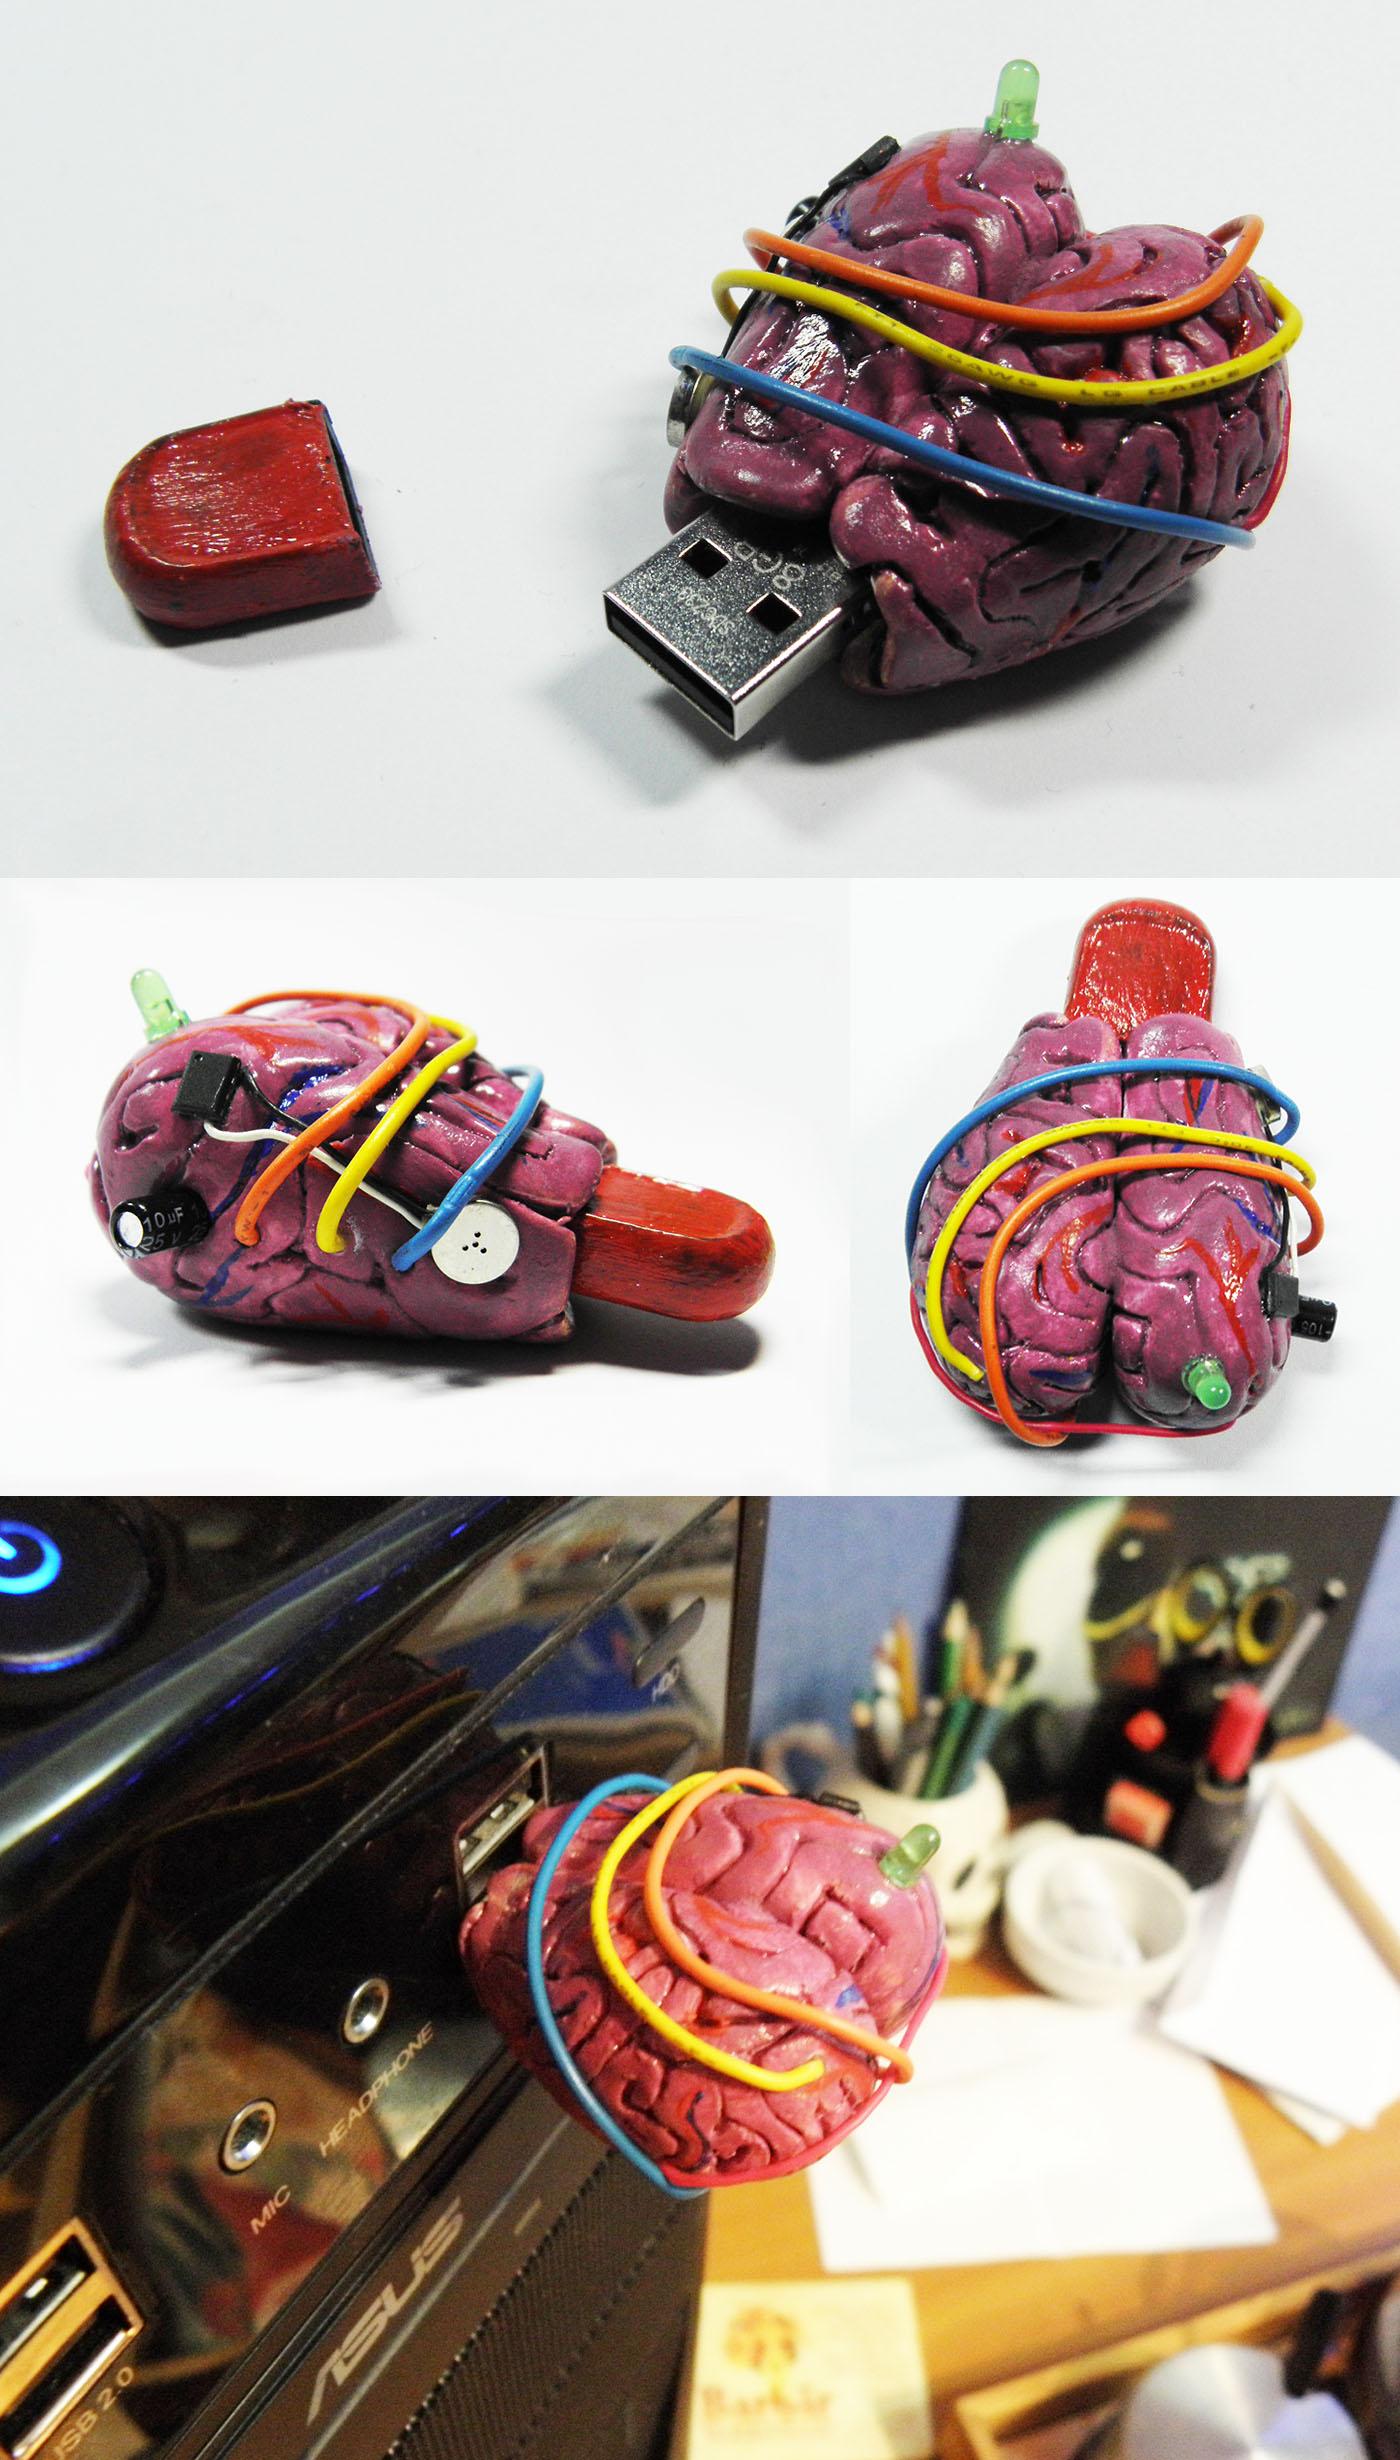 8gb USB brain